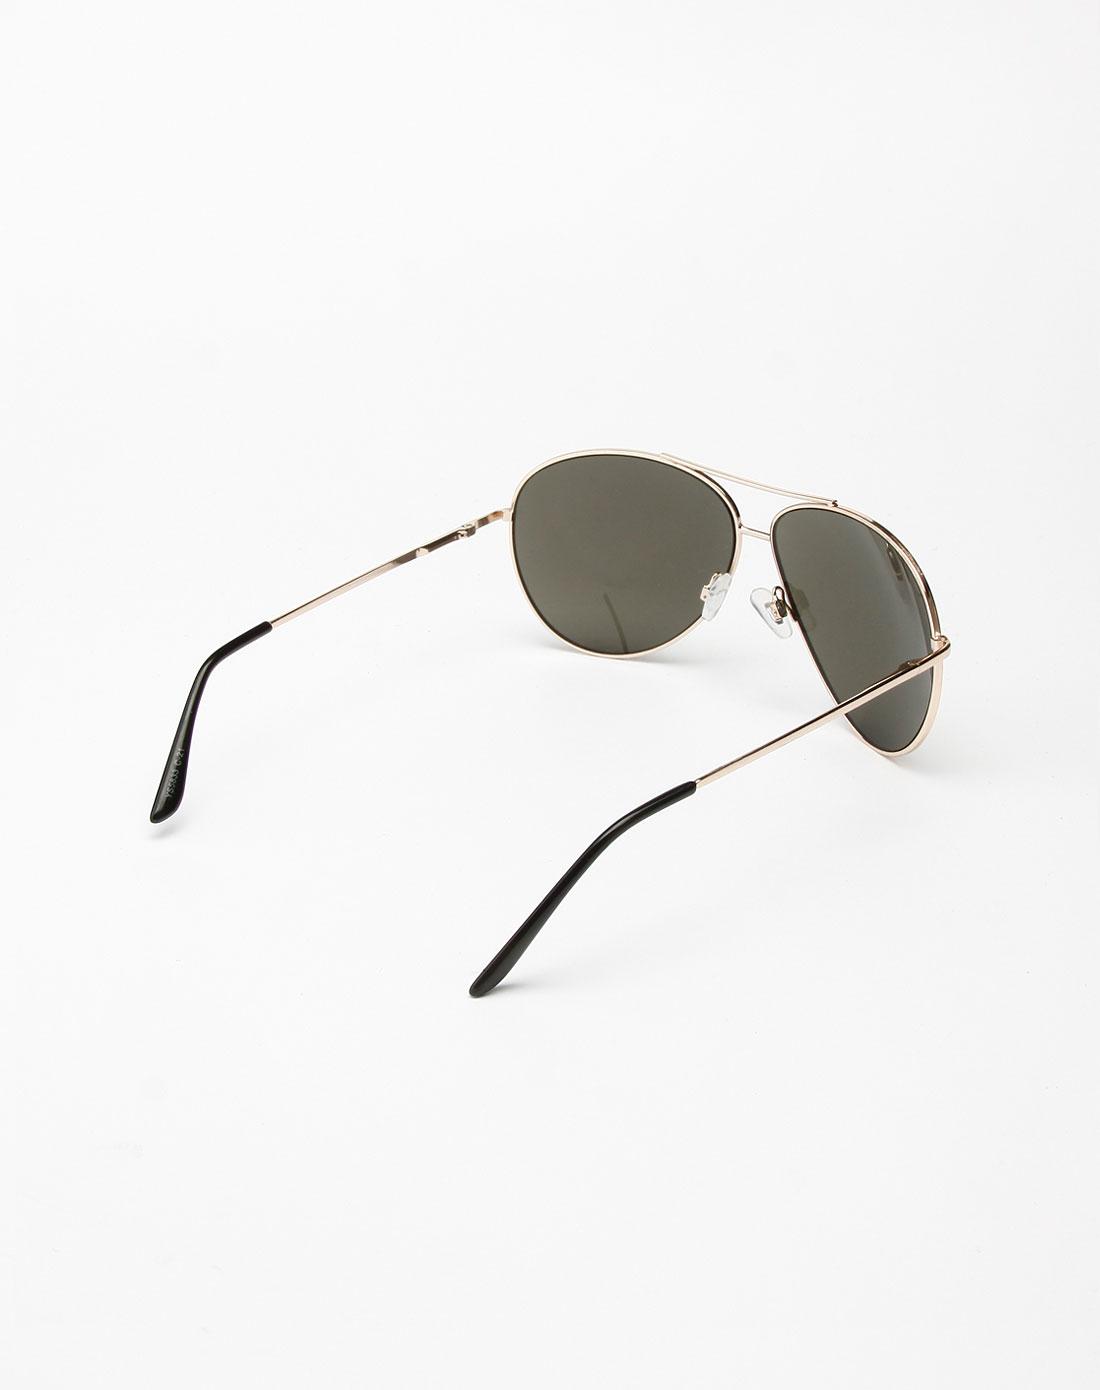 b&balos 黑色金边时尚眼镜